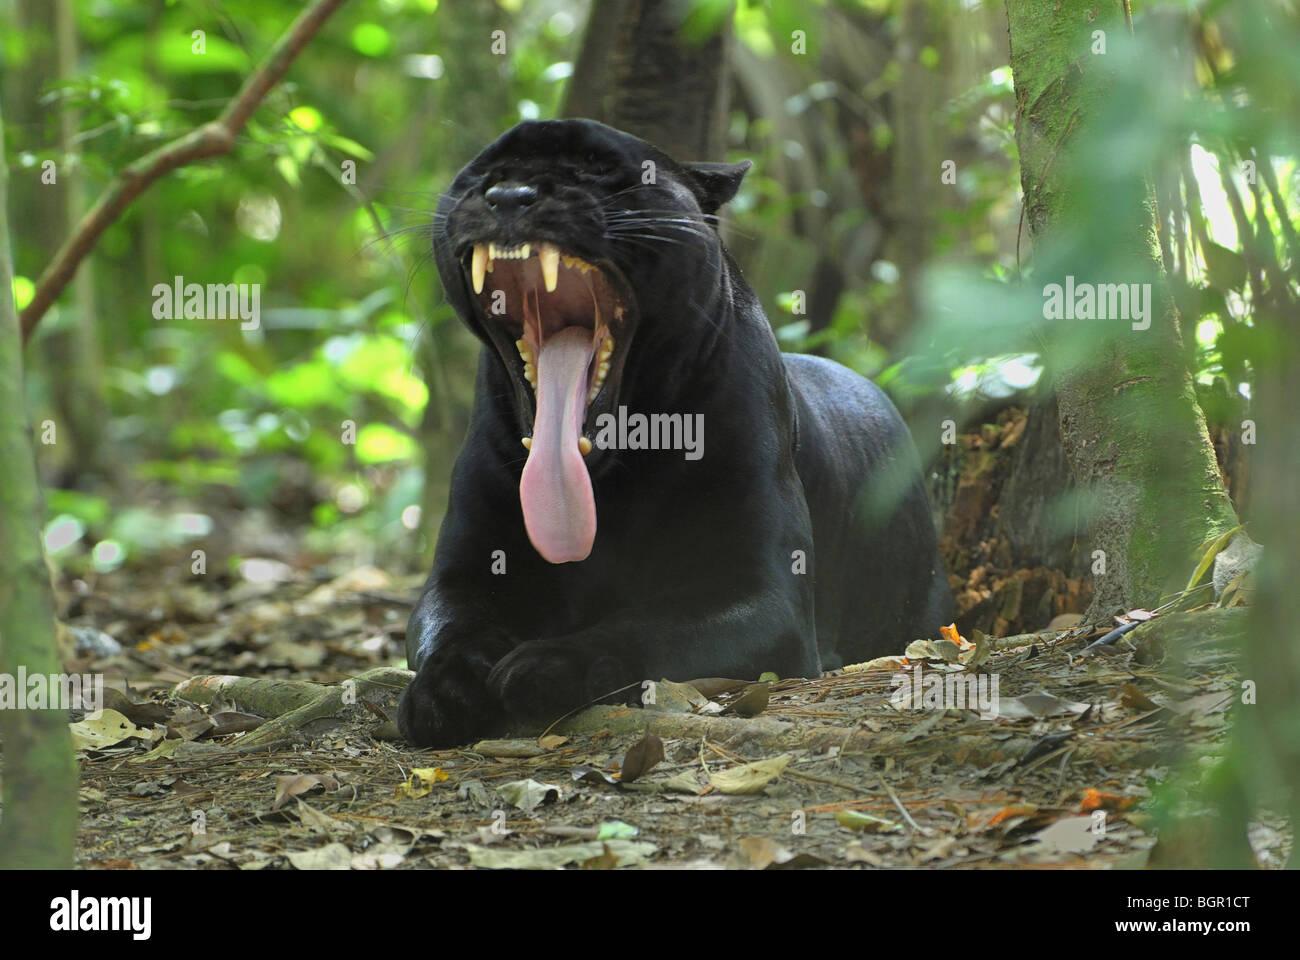 Black Jaguar or Panther (Panthera onca), adult yawning, Belize - Stock Image